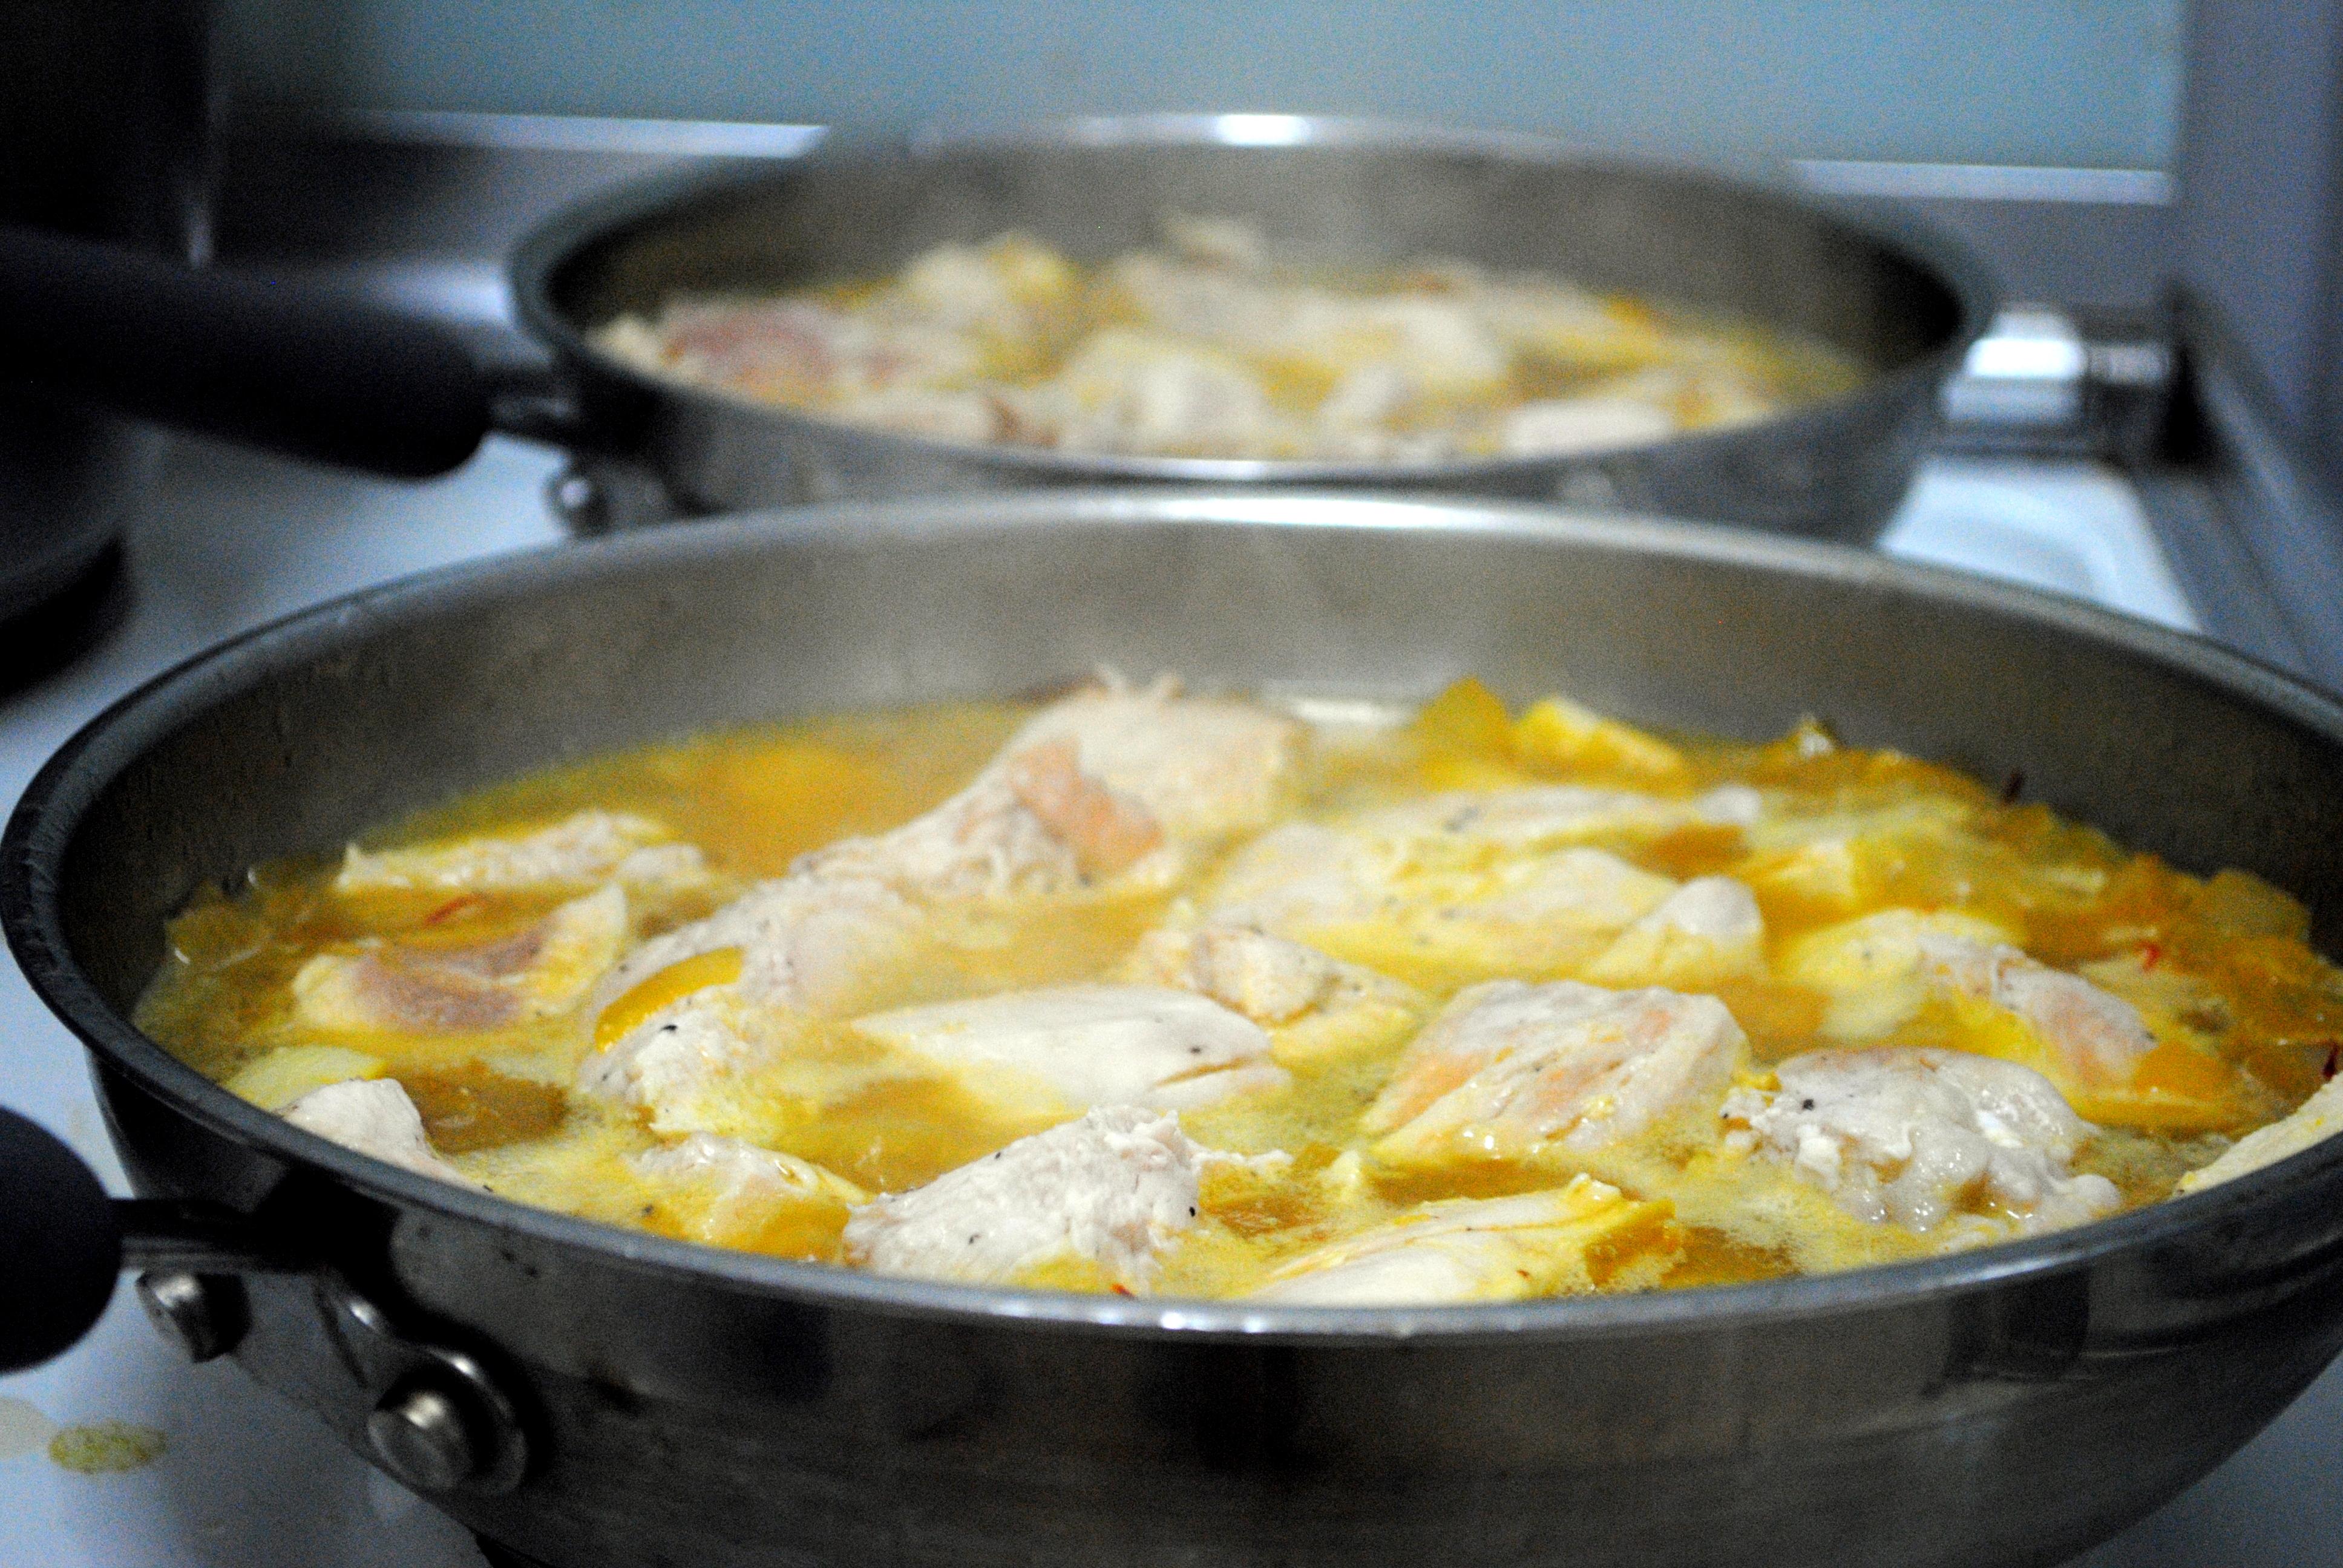 and lemon parsley yogurt sauce saffron chicken with parsley and lemon ...